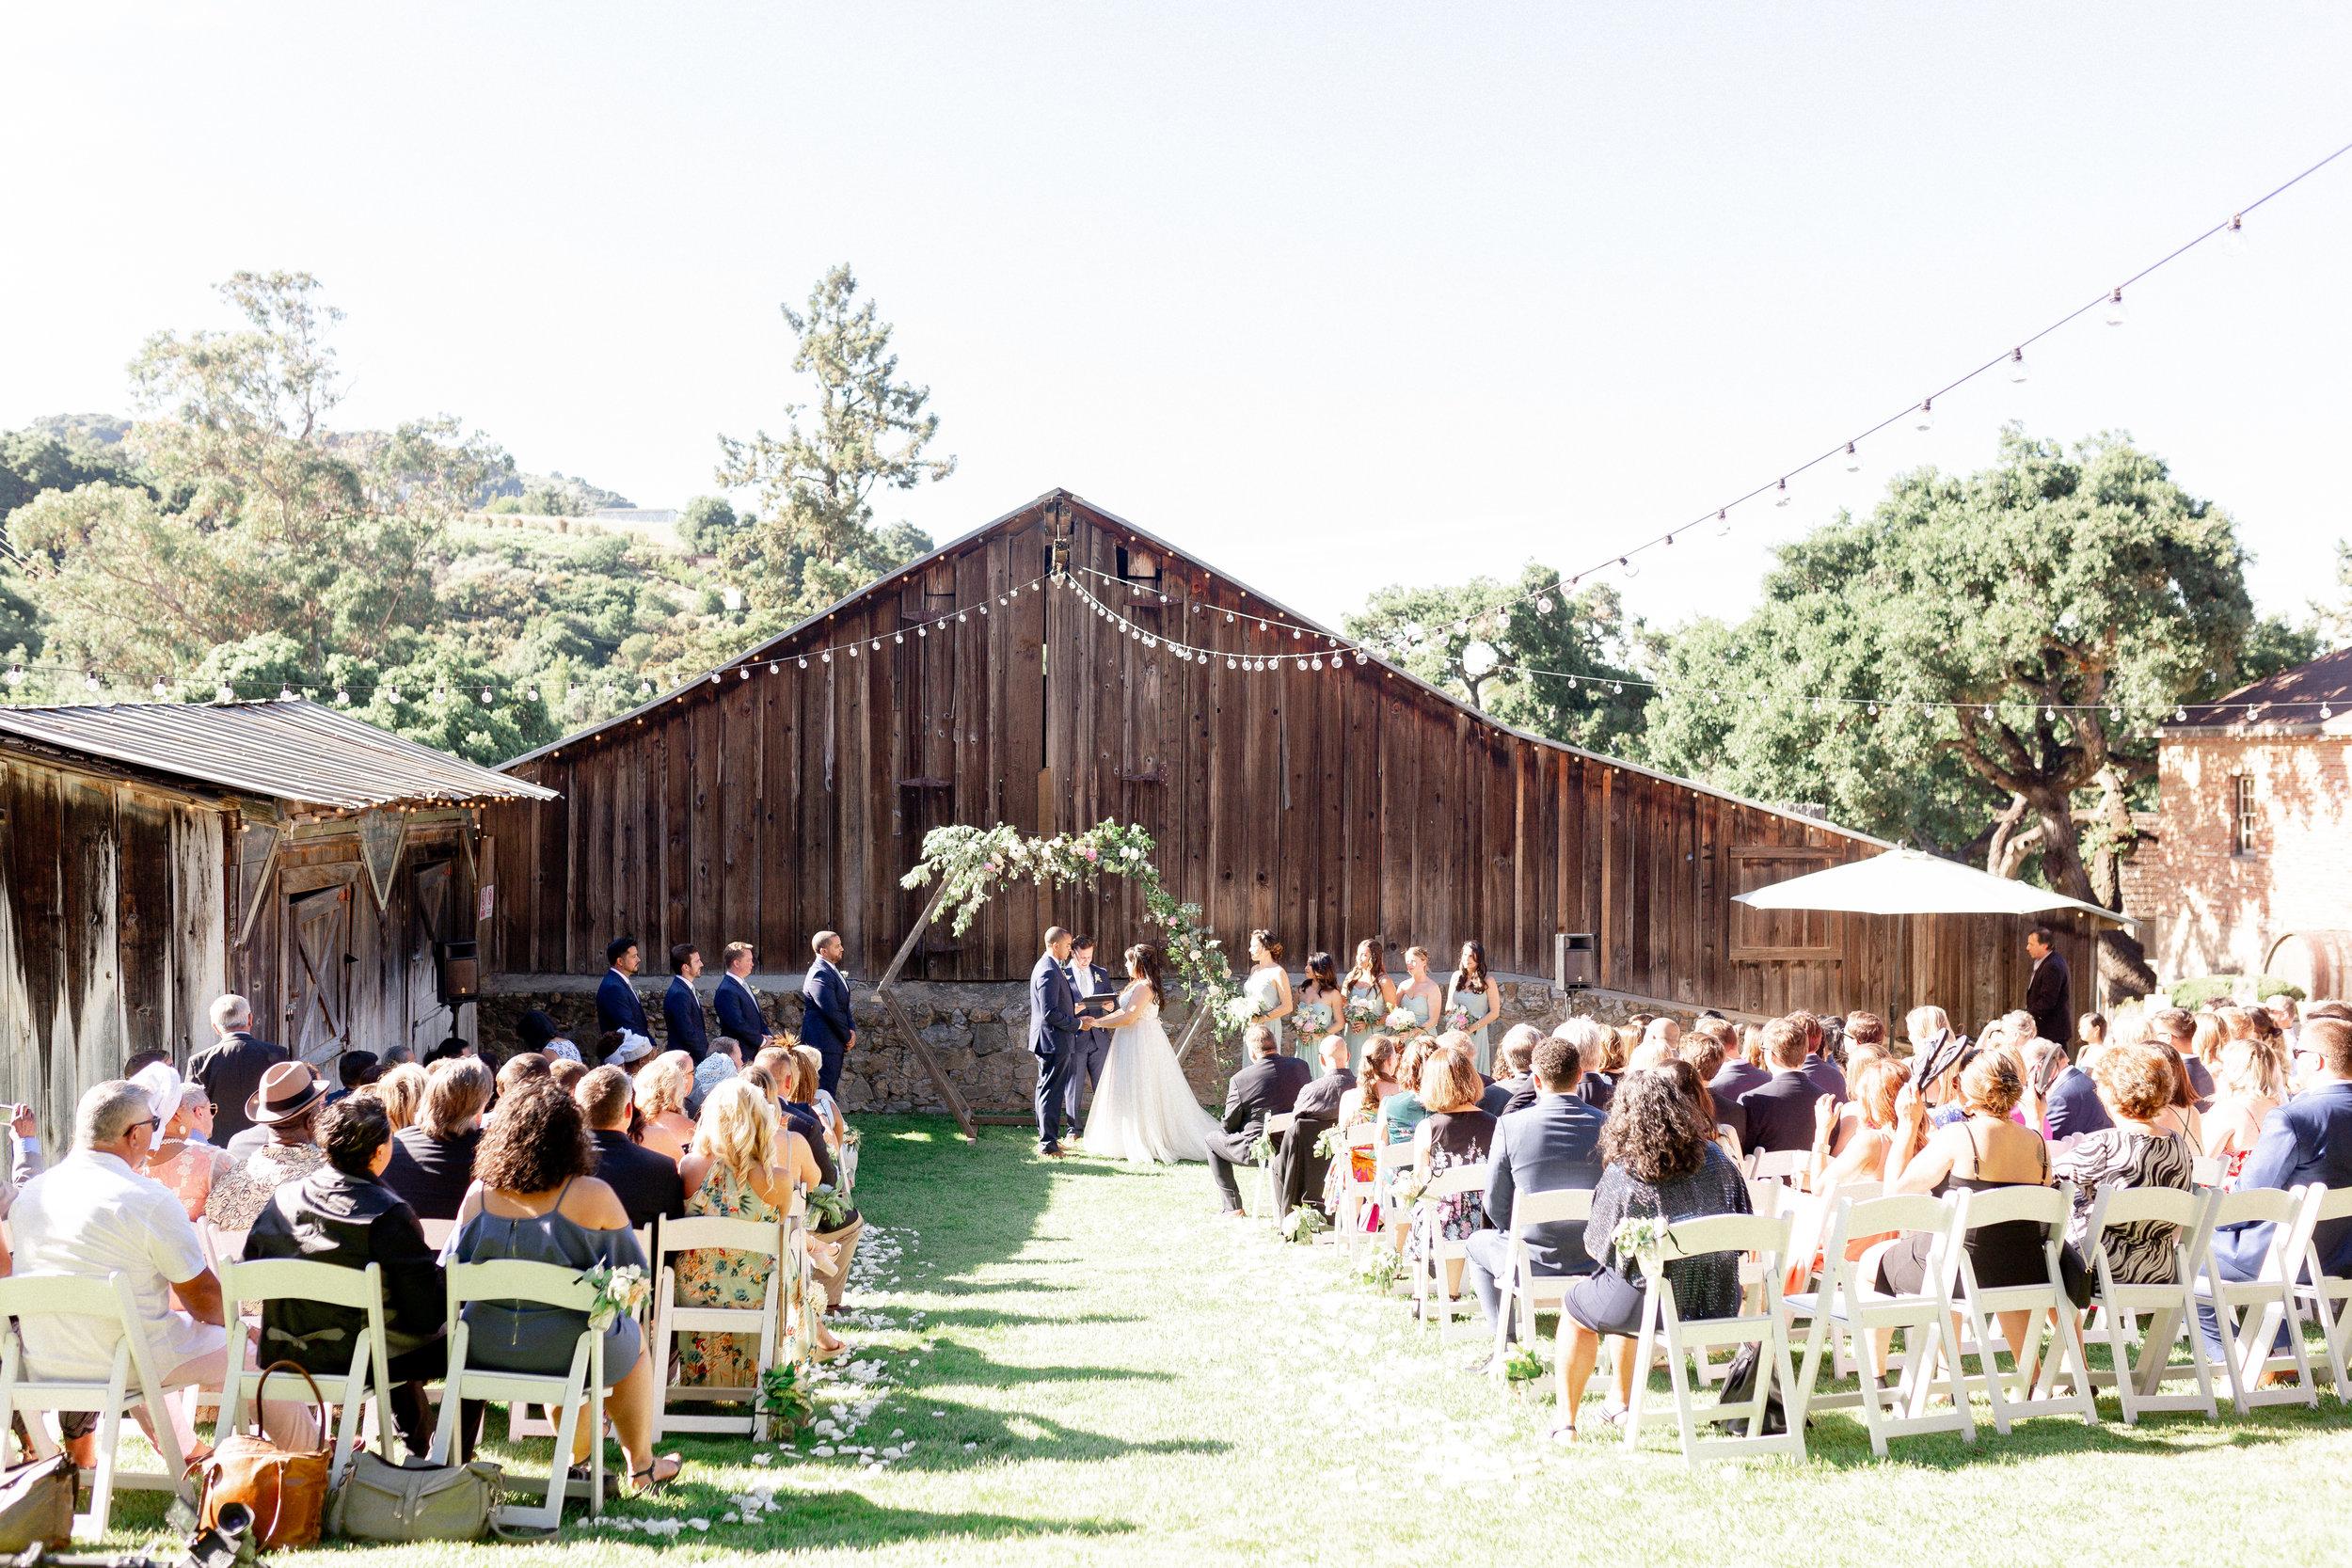 Picchetti-Winery-wedding-photos (1 of 3).jpg